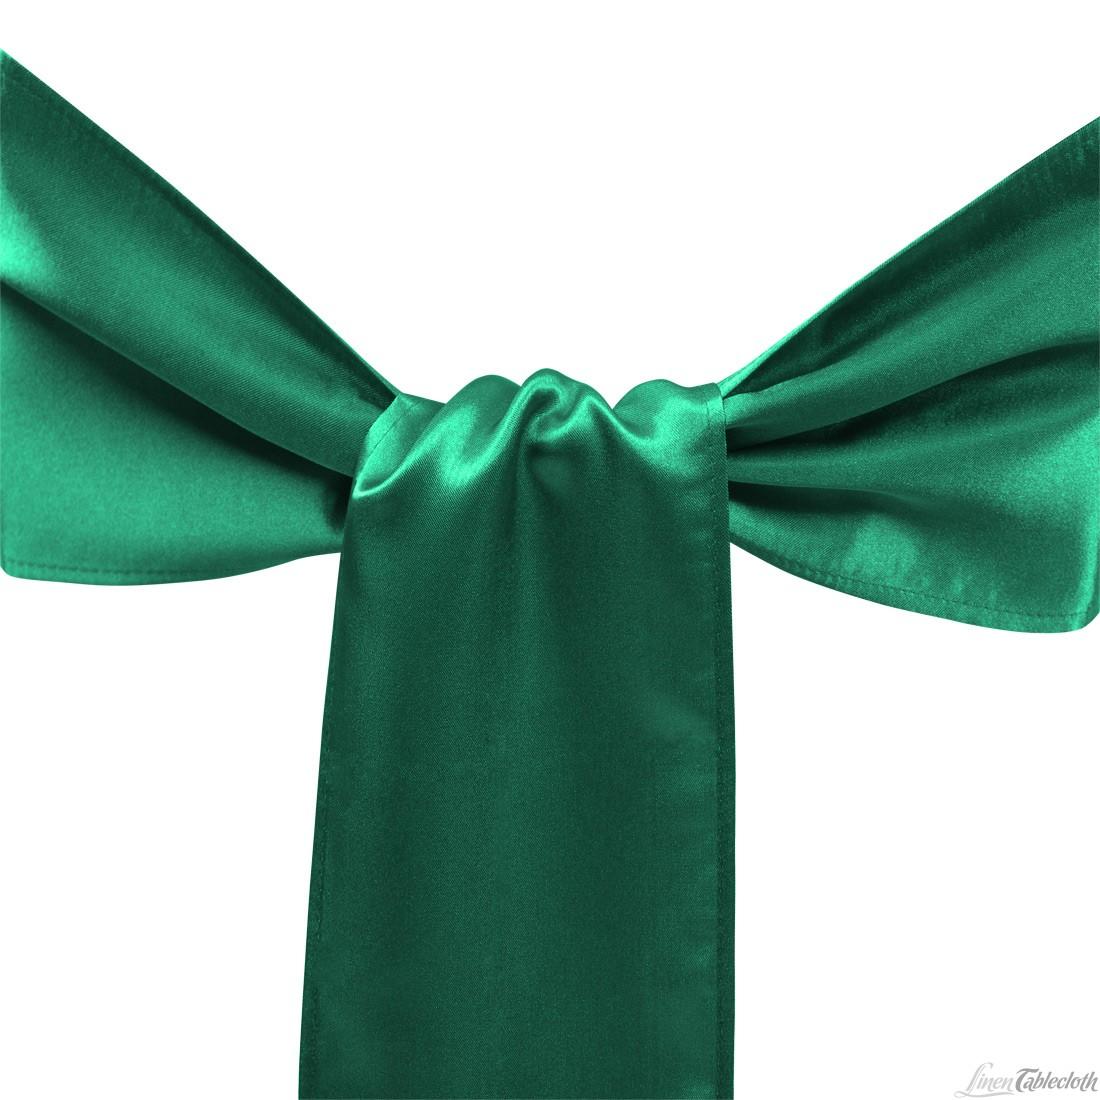 Smaragdovo zelená saténová mašla - Obrázok č. 1